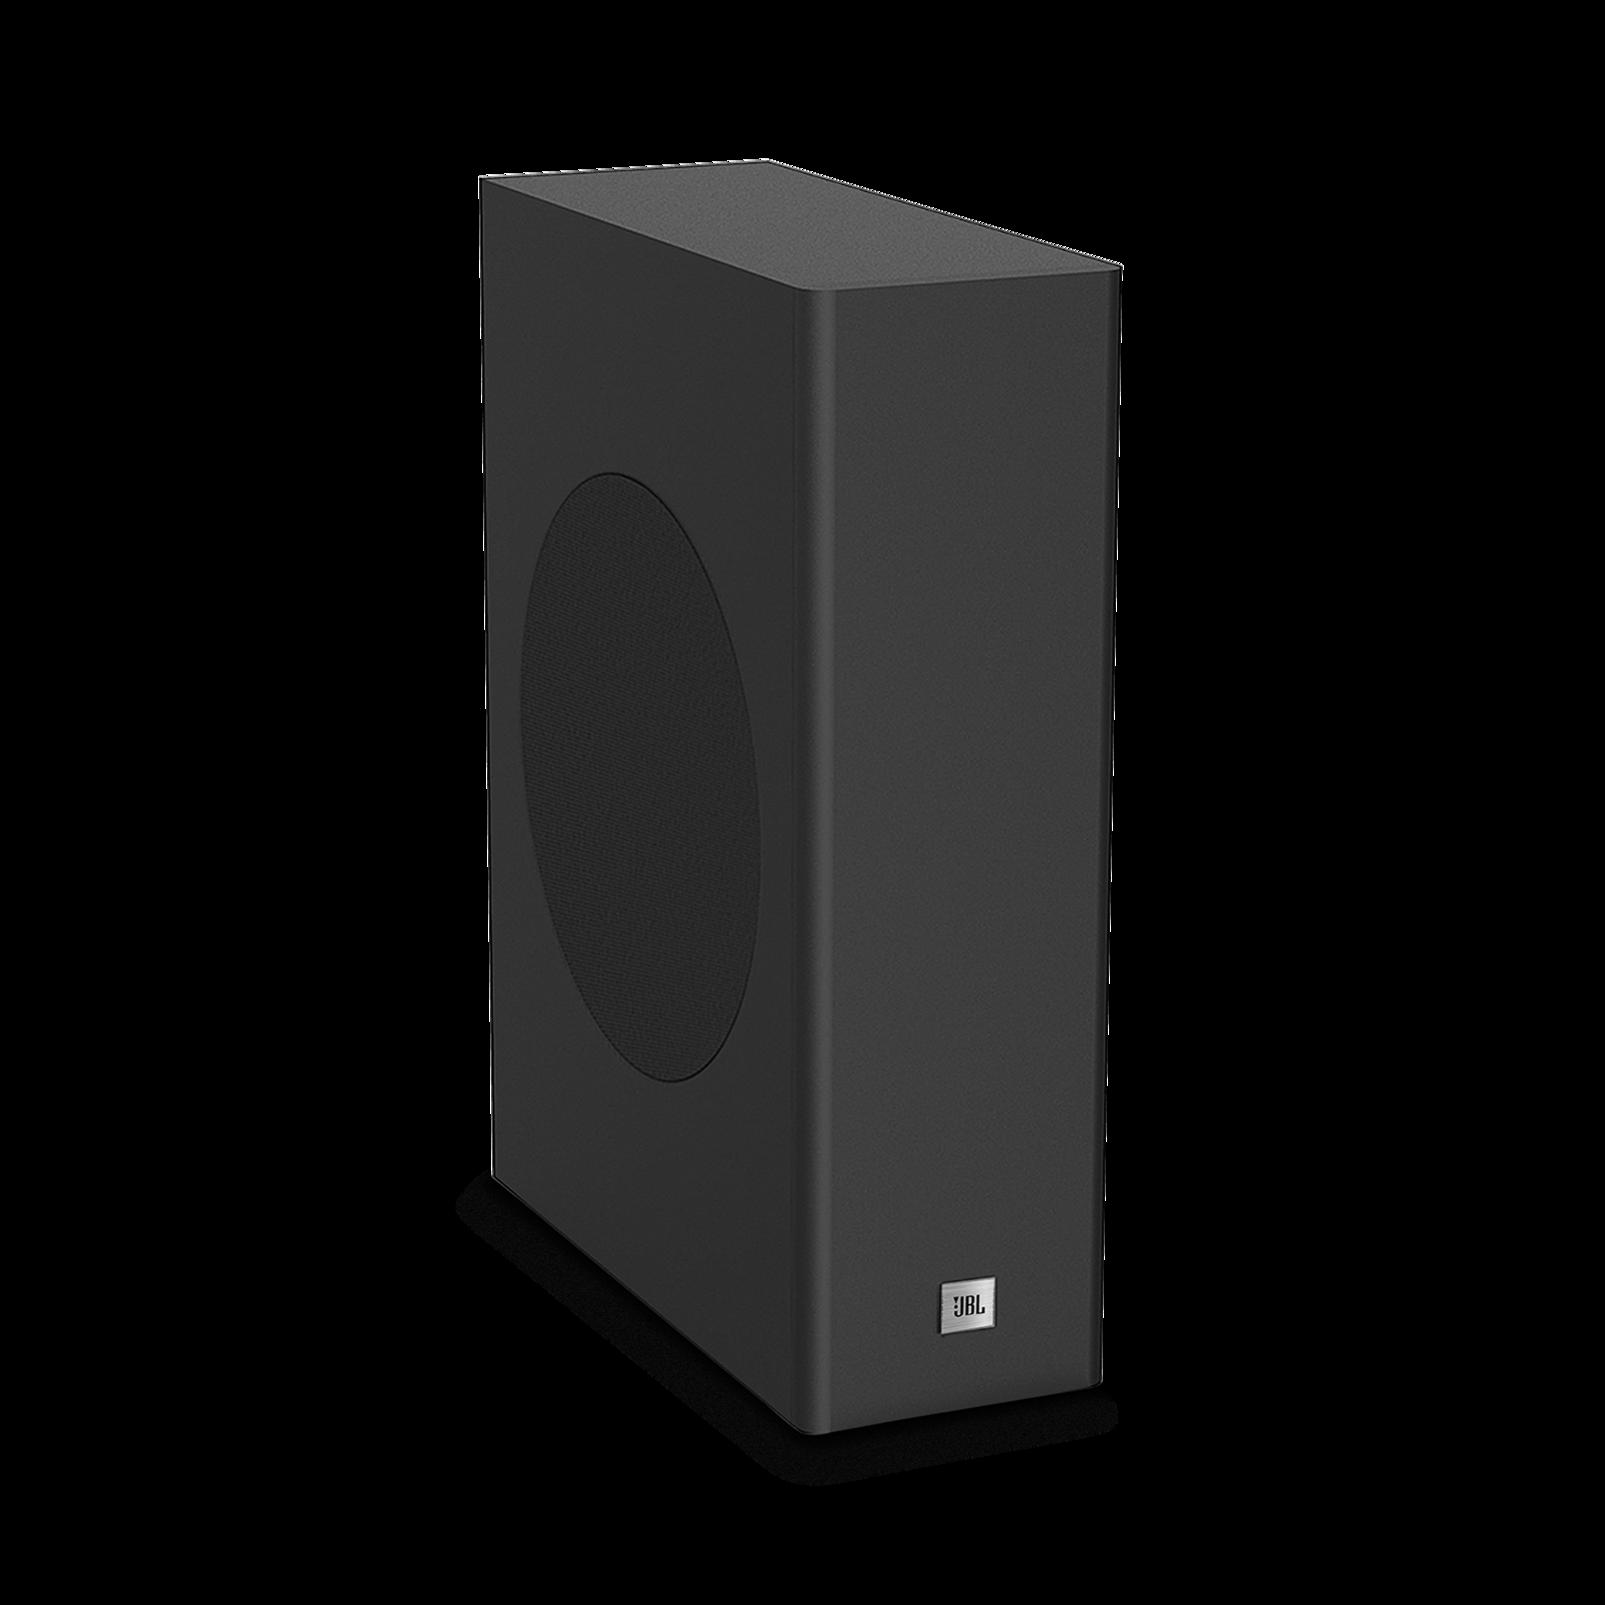 Cinema Sb150 Compact 150w Home Cinema Soundbar With Wireless